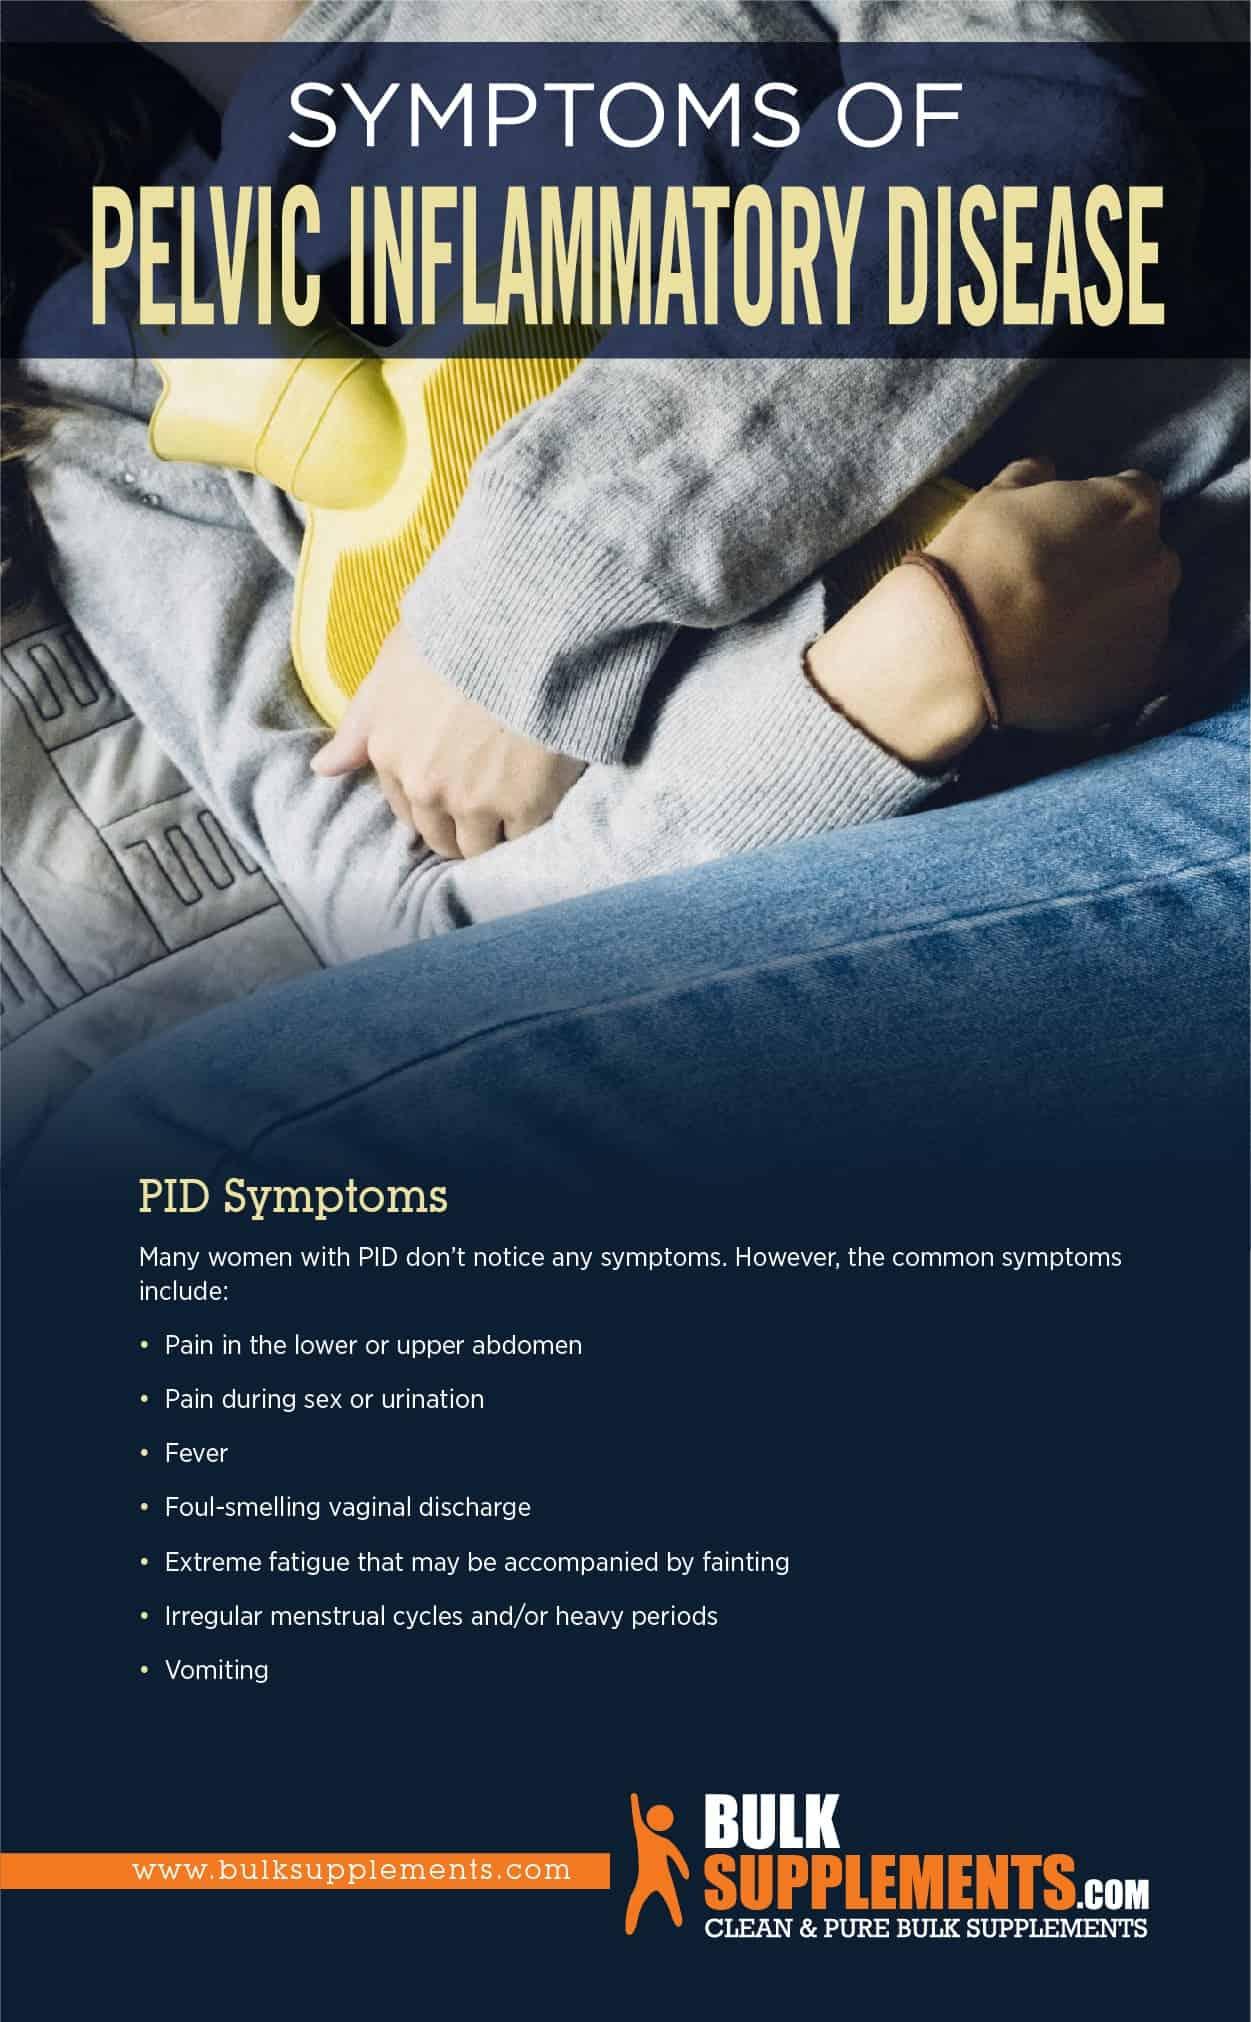 Symptoms of Pelvic Inflammatory Disease